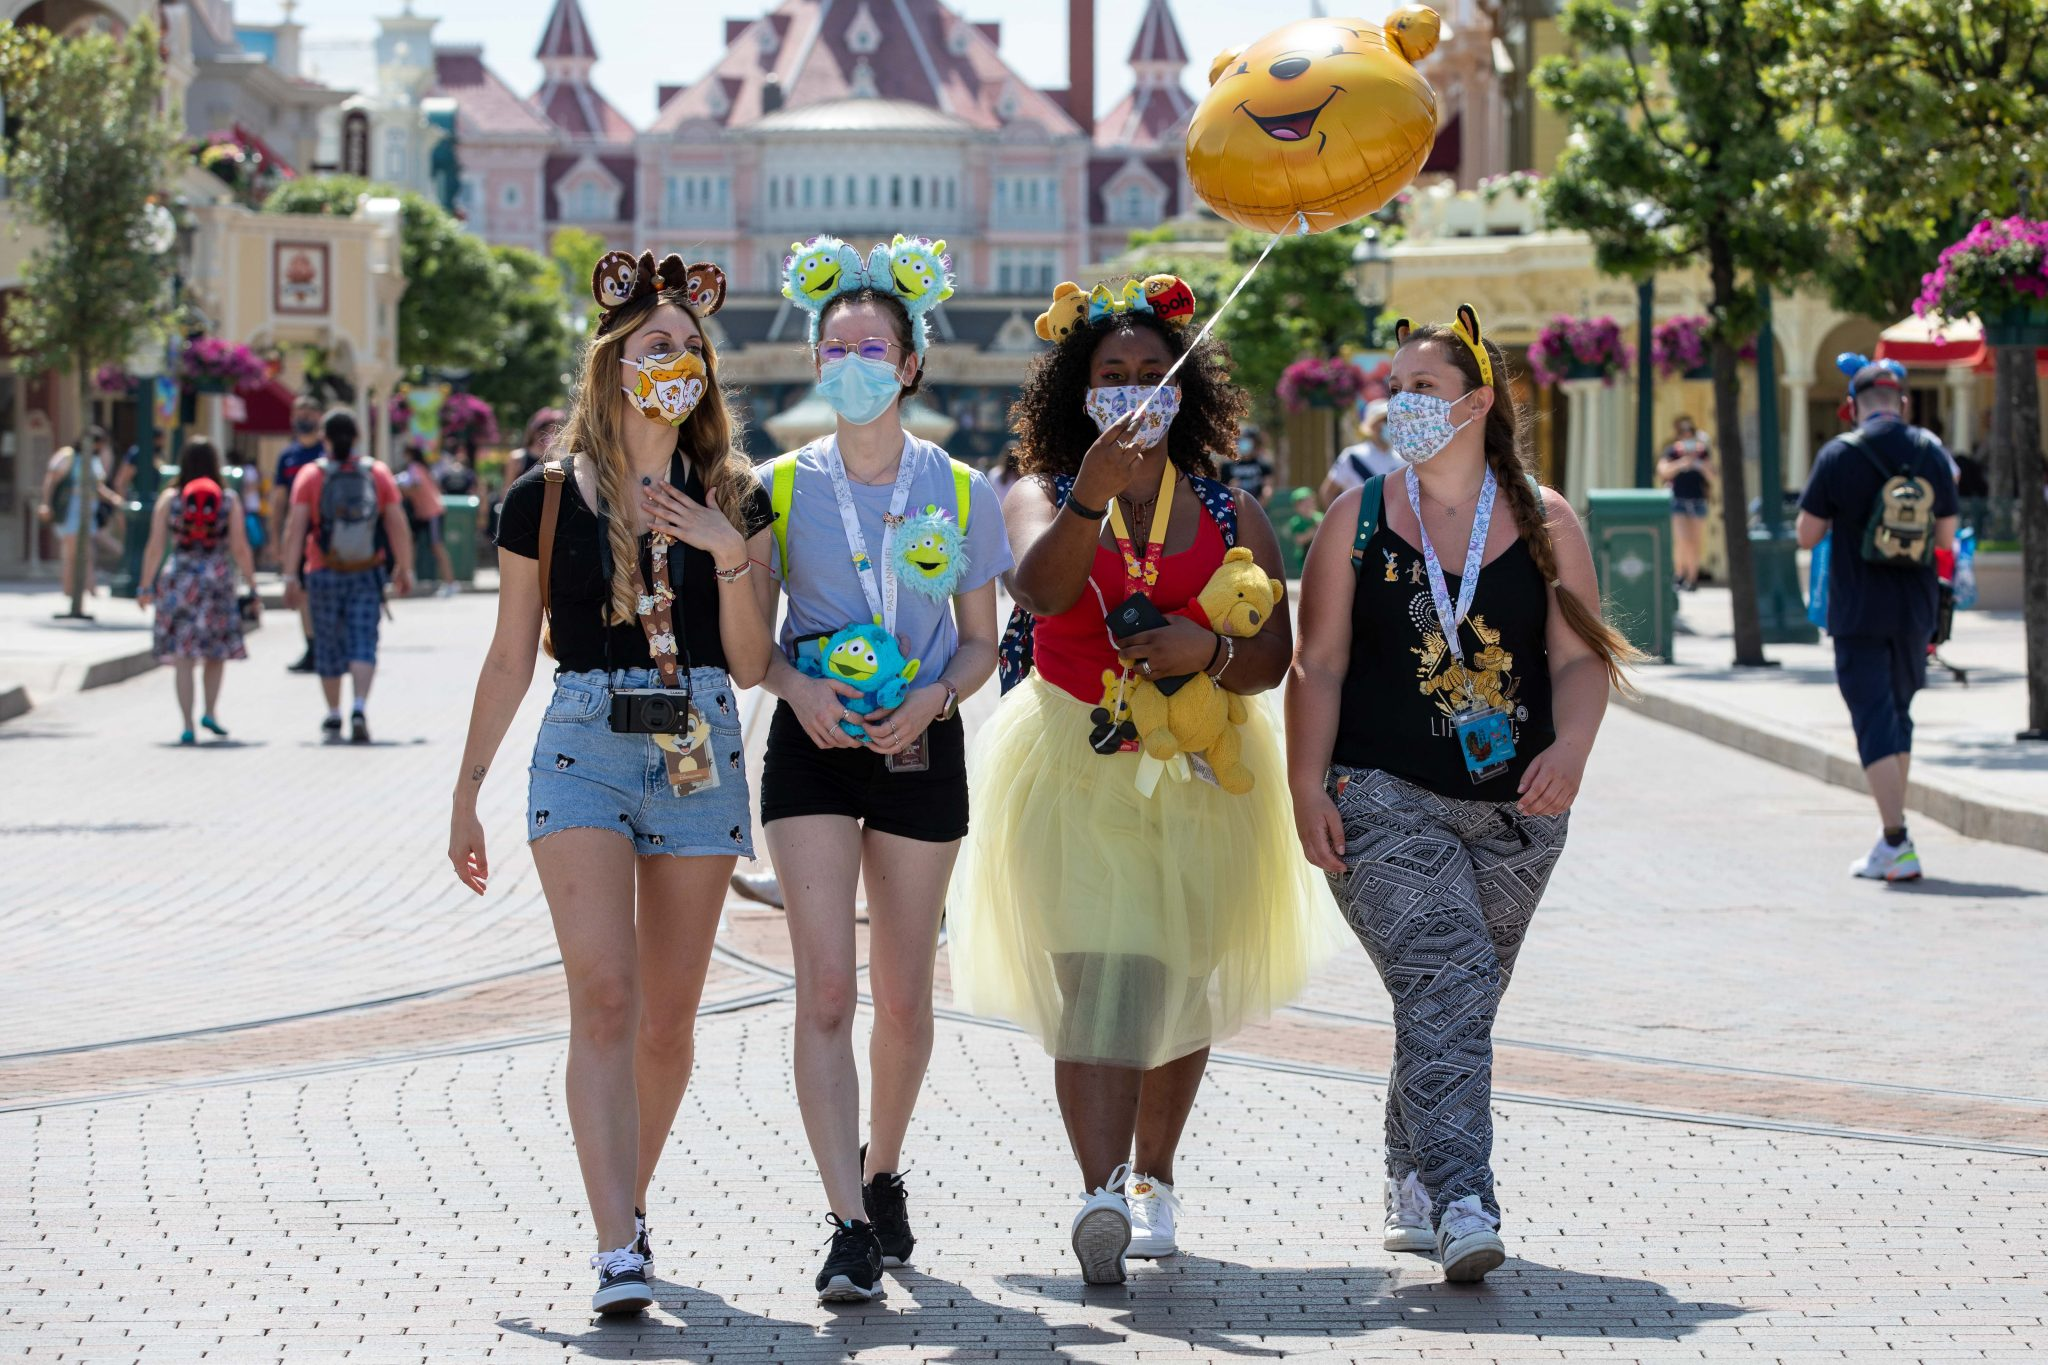 Disneyland Paris welcomes guests